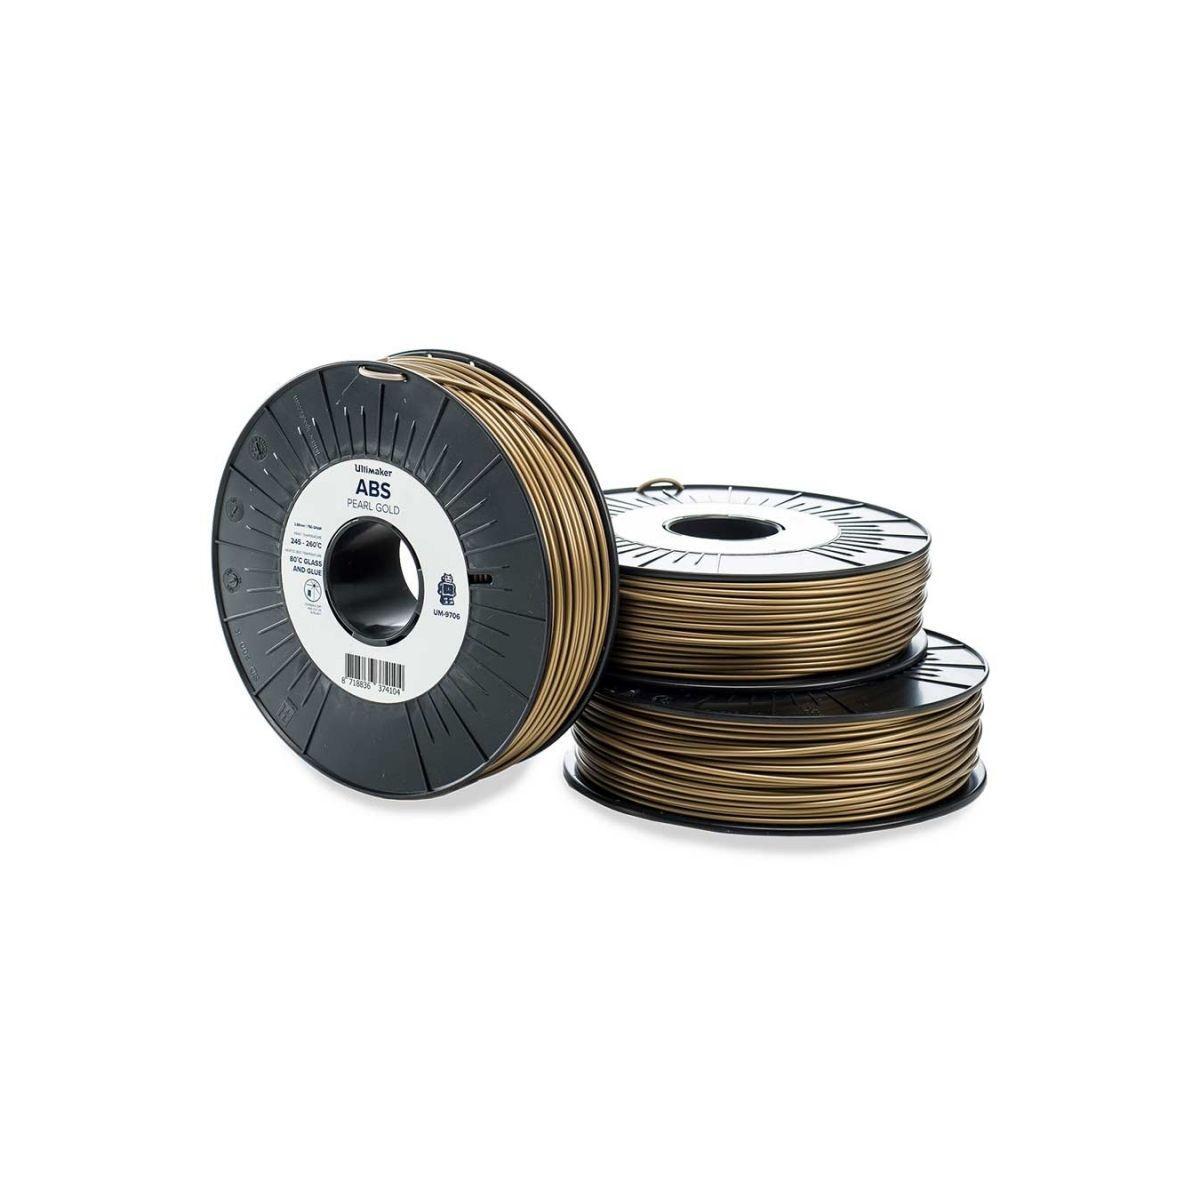 Filament 3d ultimaker abs or 2.85mm - 2% de remise imm?diate a...